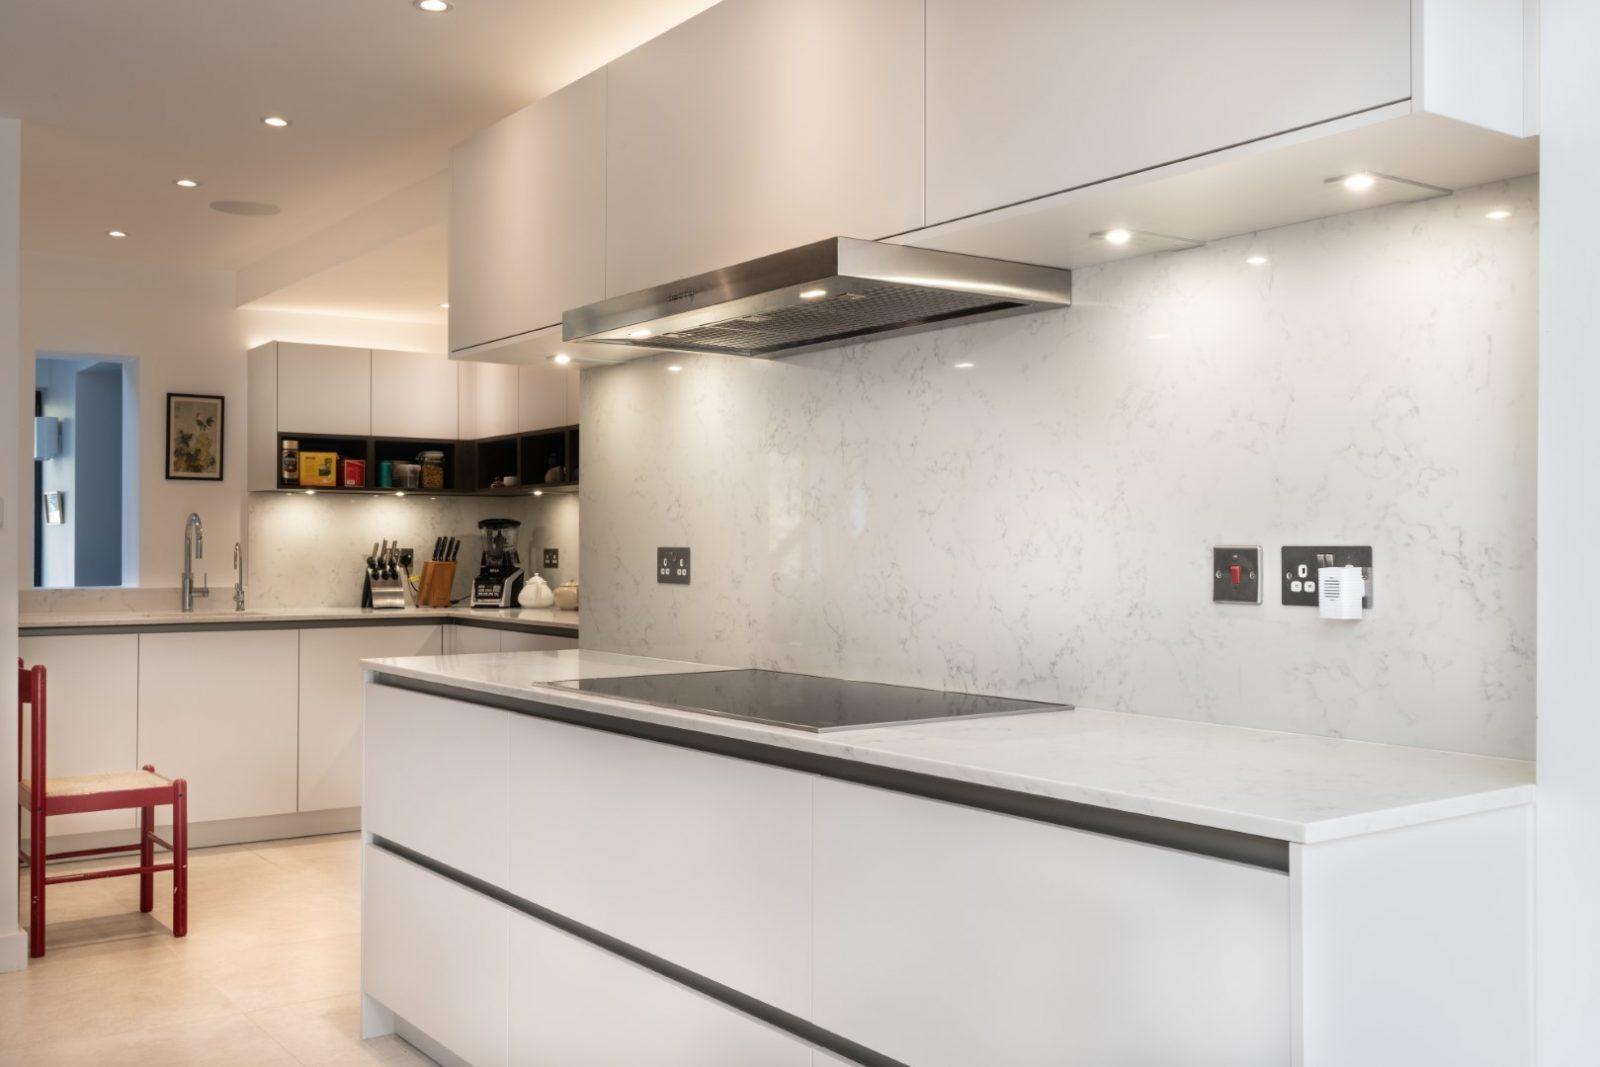 Kitchen of the week… Located in Cambridge showcasing the Monaco Carrera